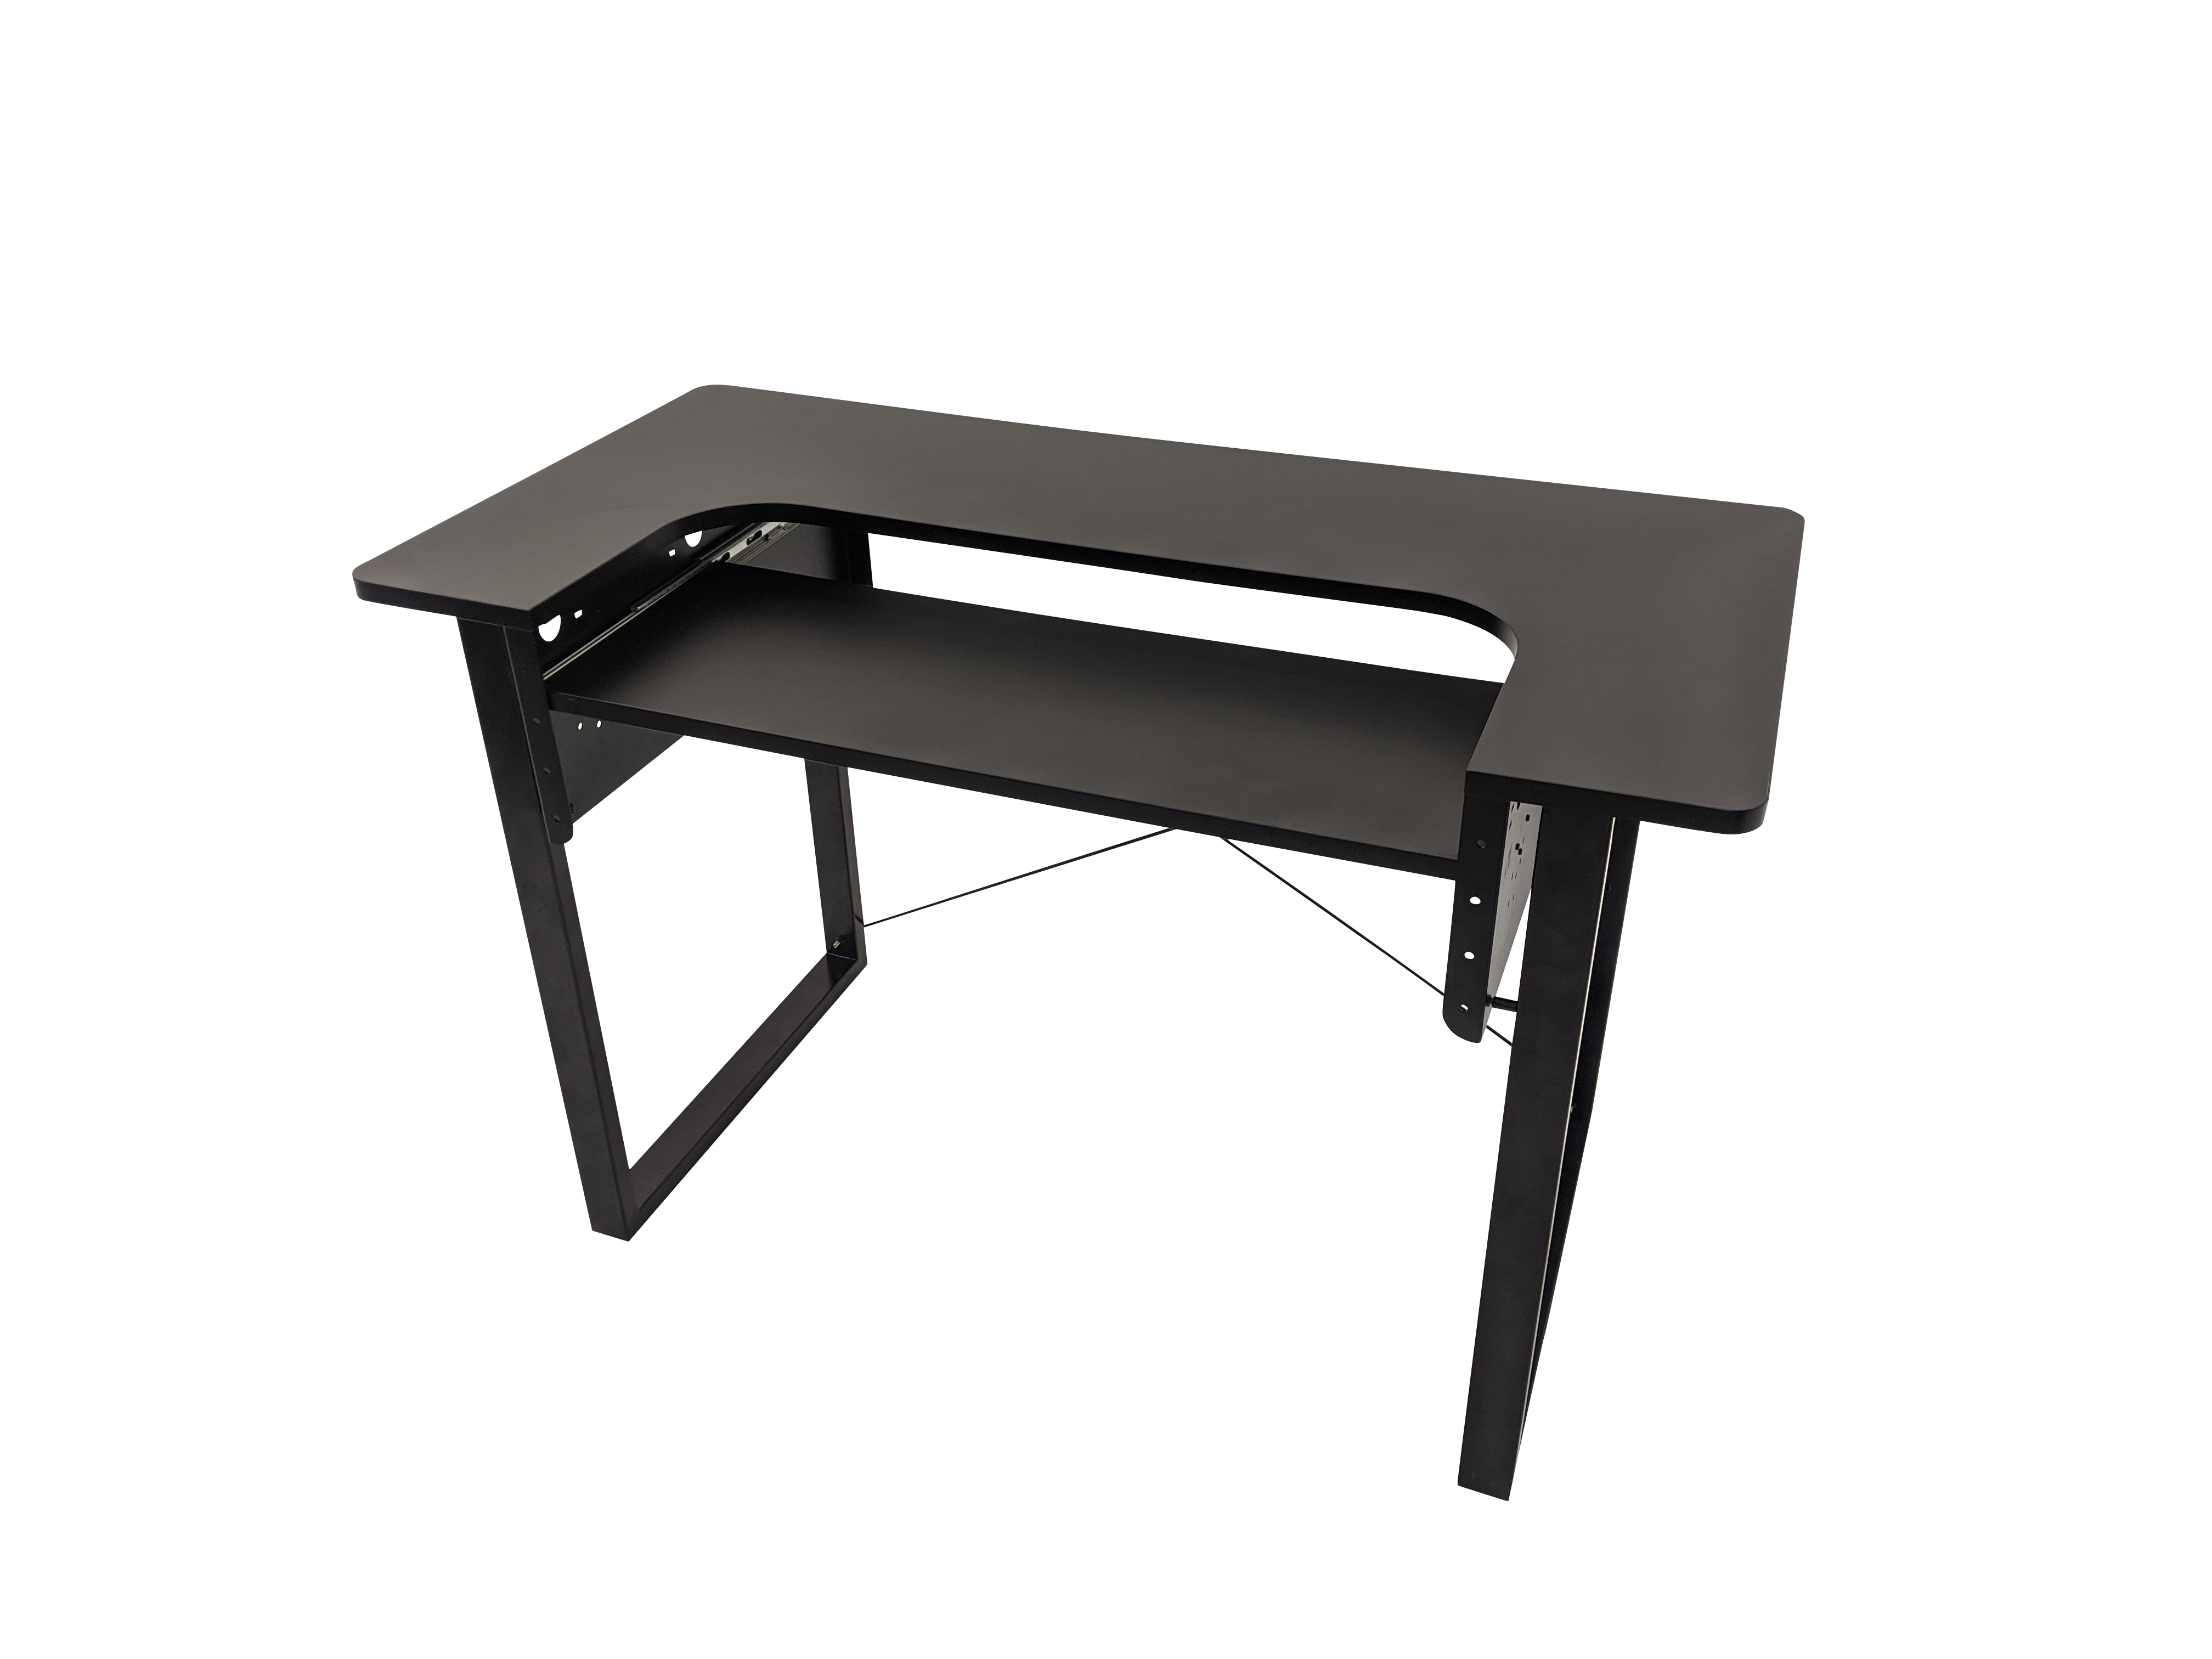 ARCdesk mini